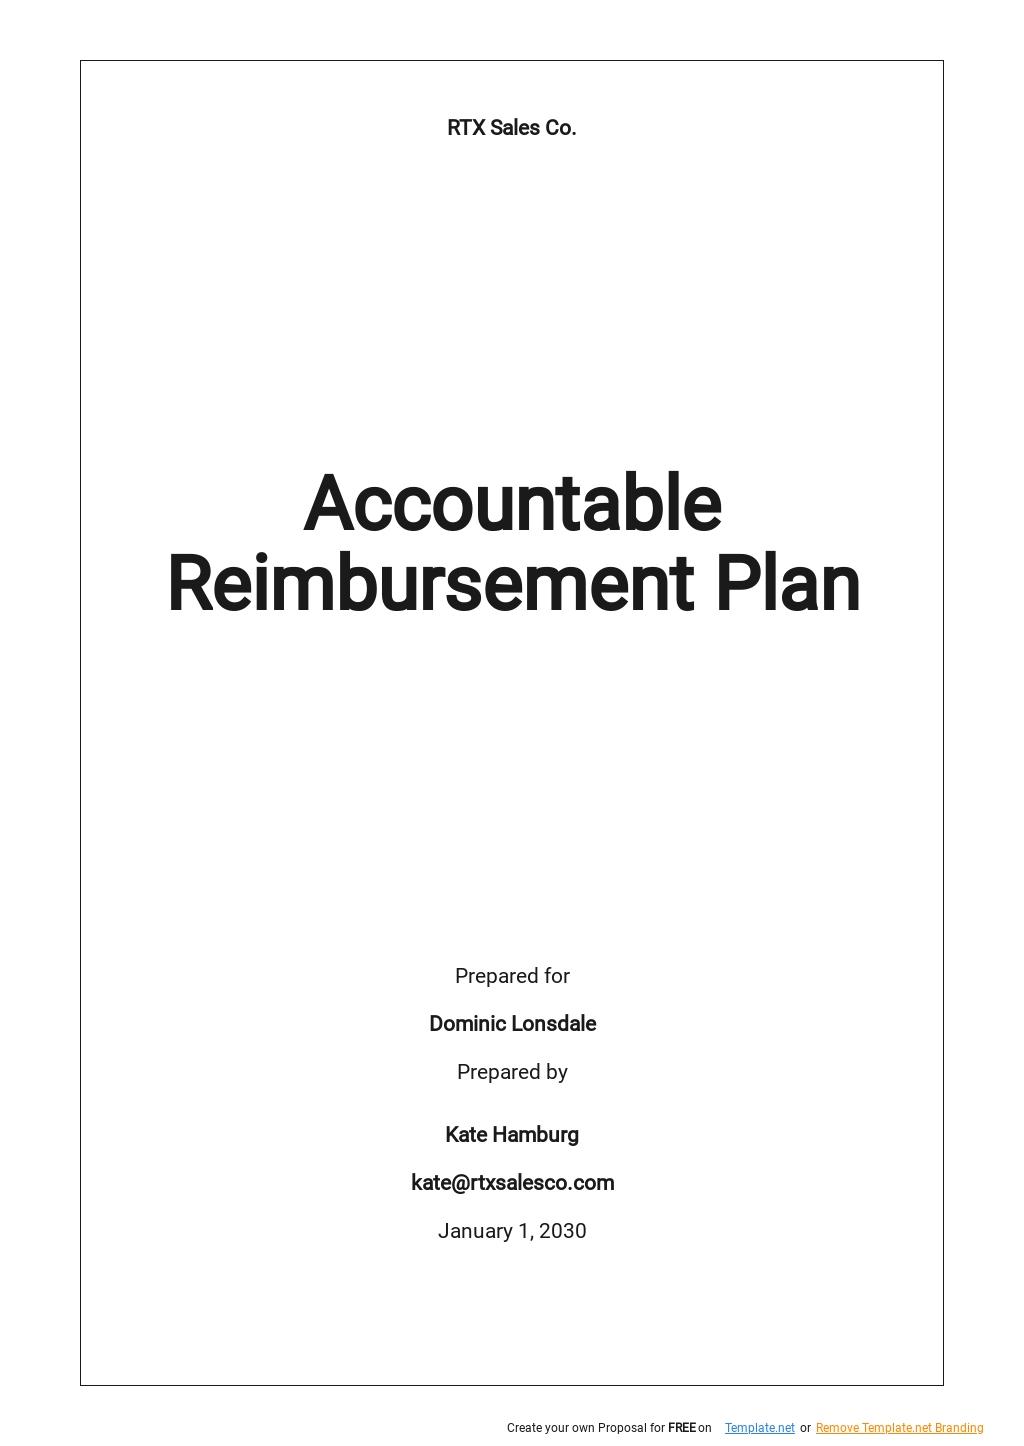 Accountable Reimbursement Plan Template [Free PDF